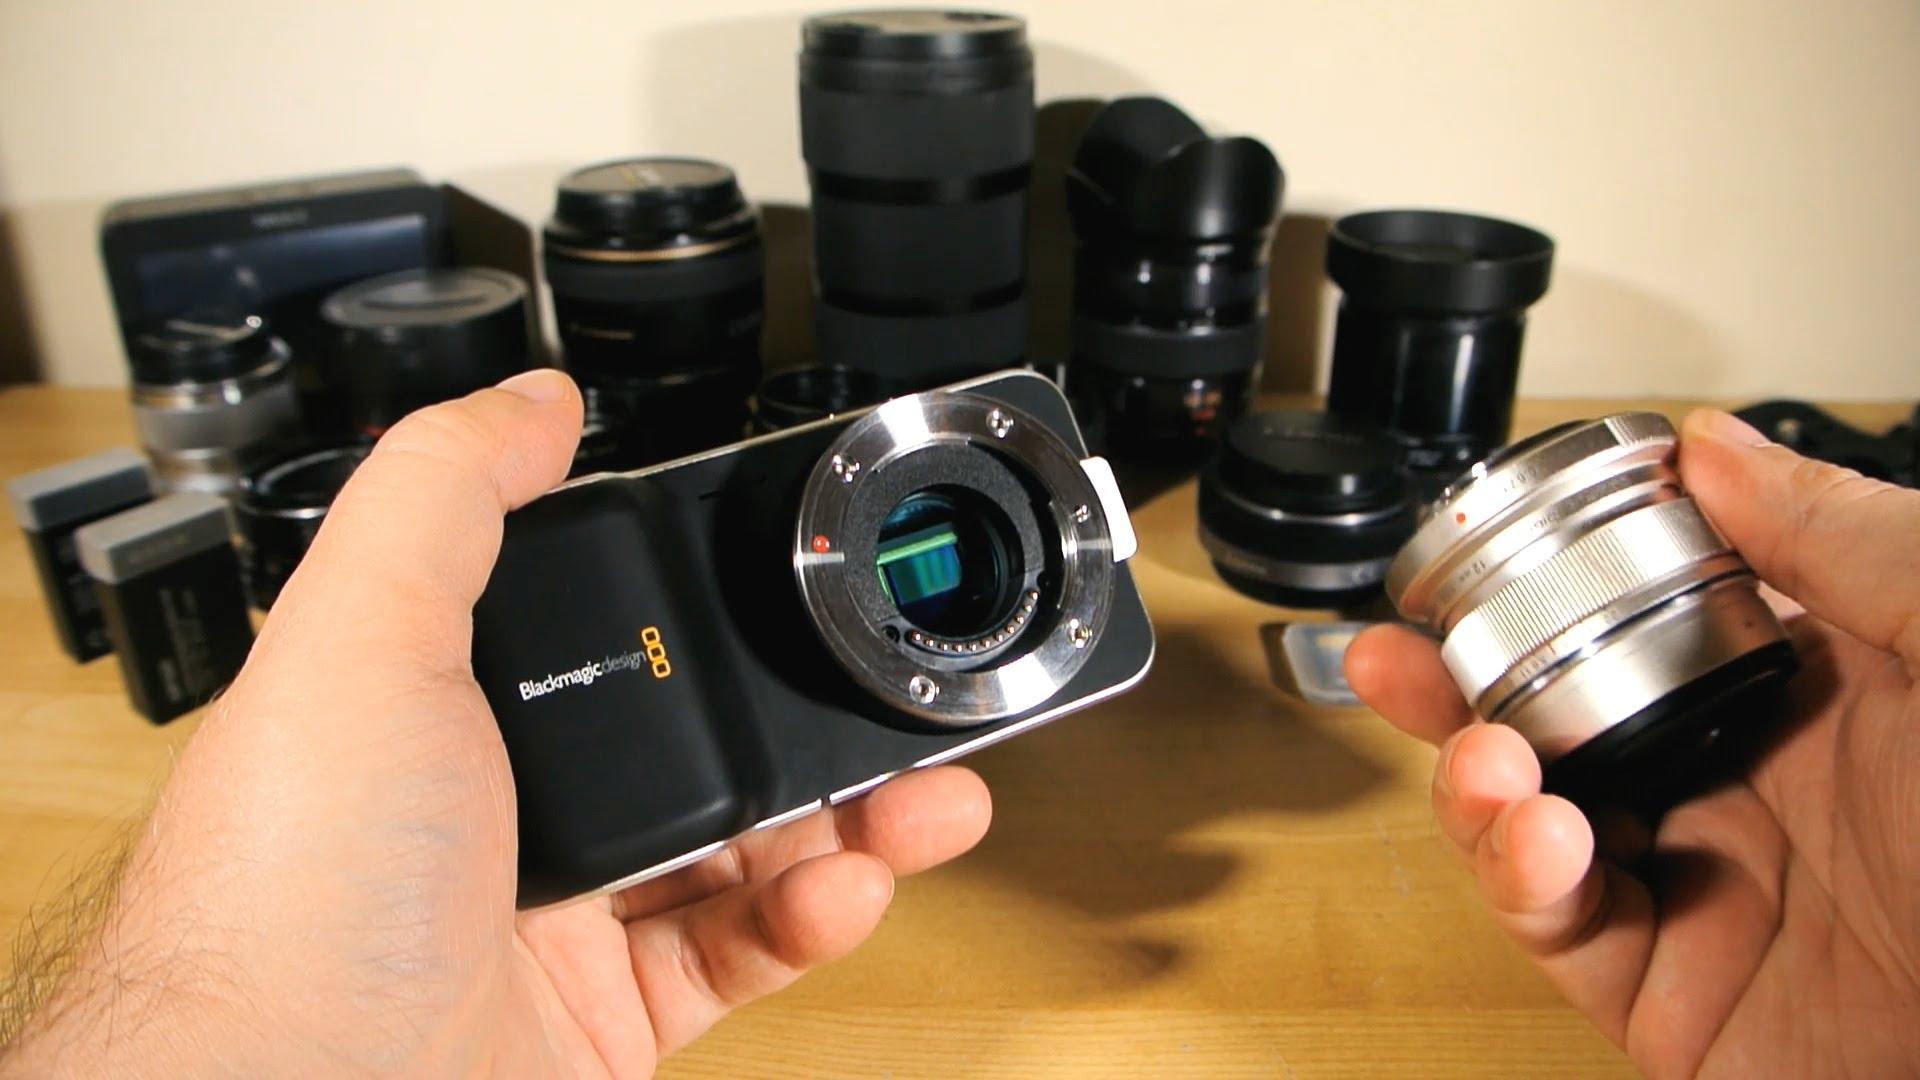 Blackmagic Pocket Cinema Camera photos on Flickr Flickr Black magic pocket camera photos